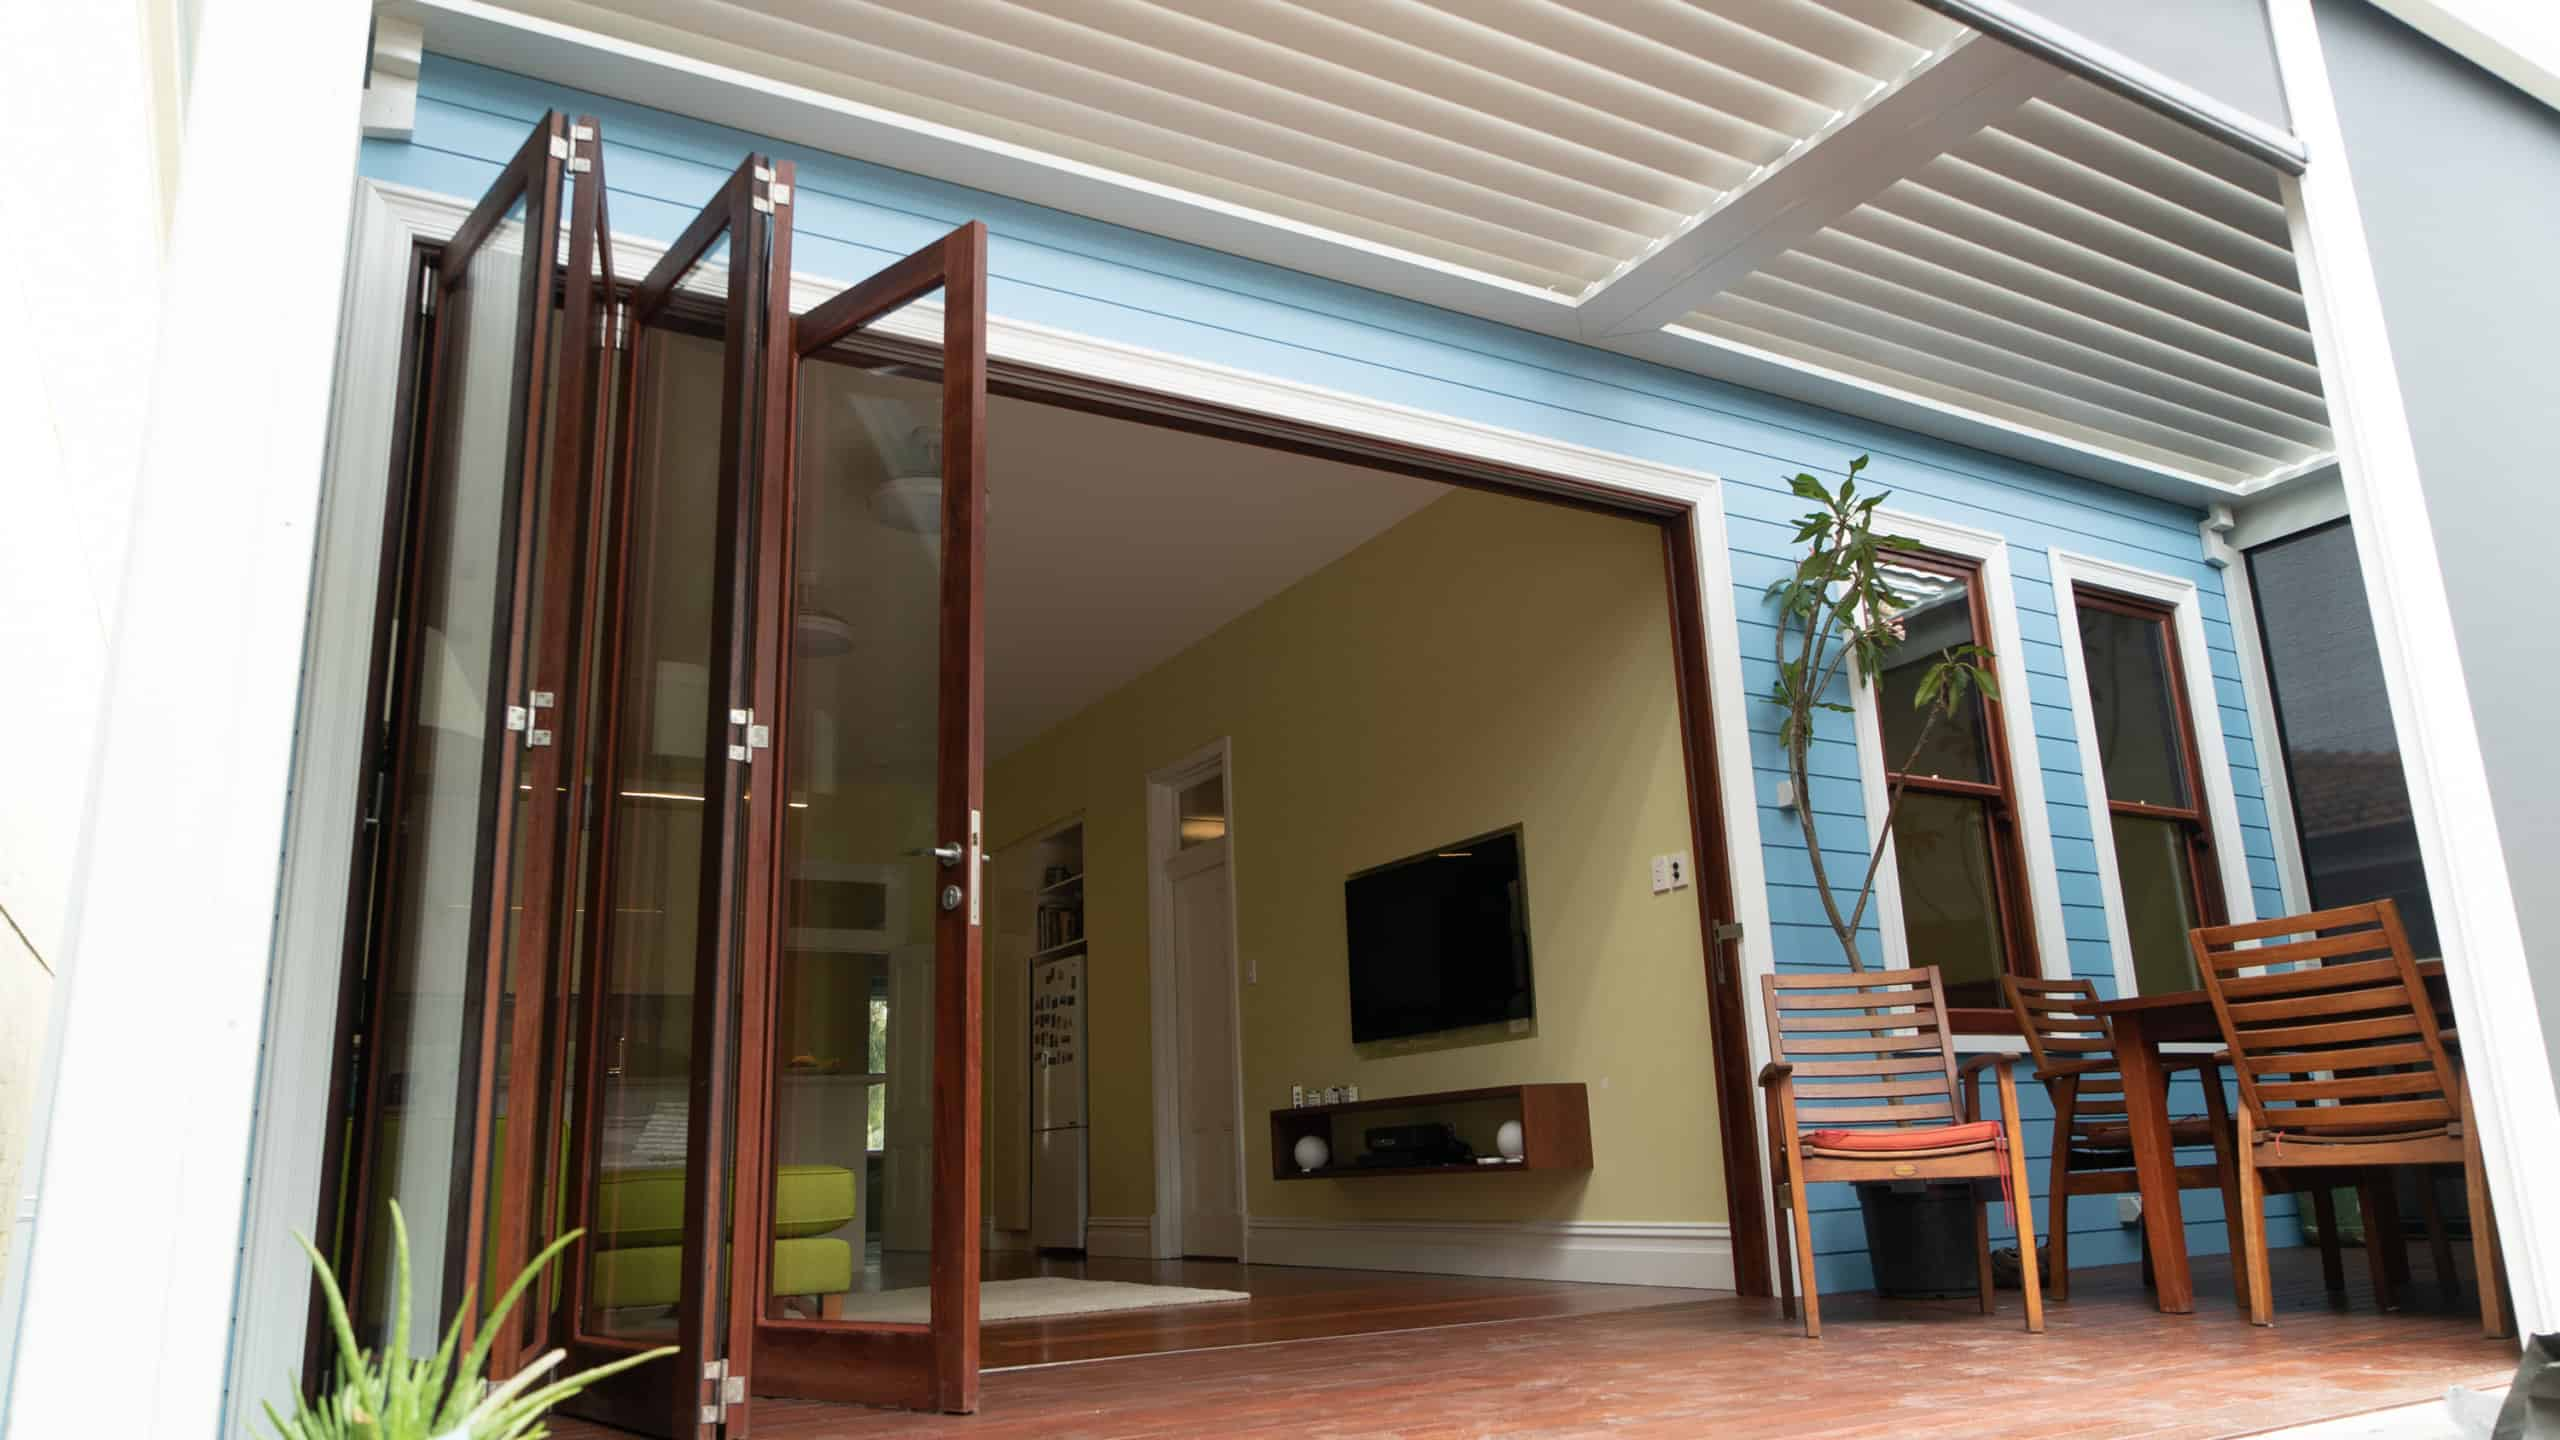 Wooden patio doors opening up onto a patio deck